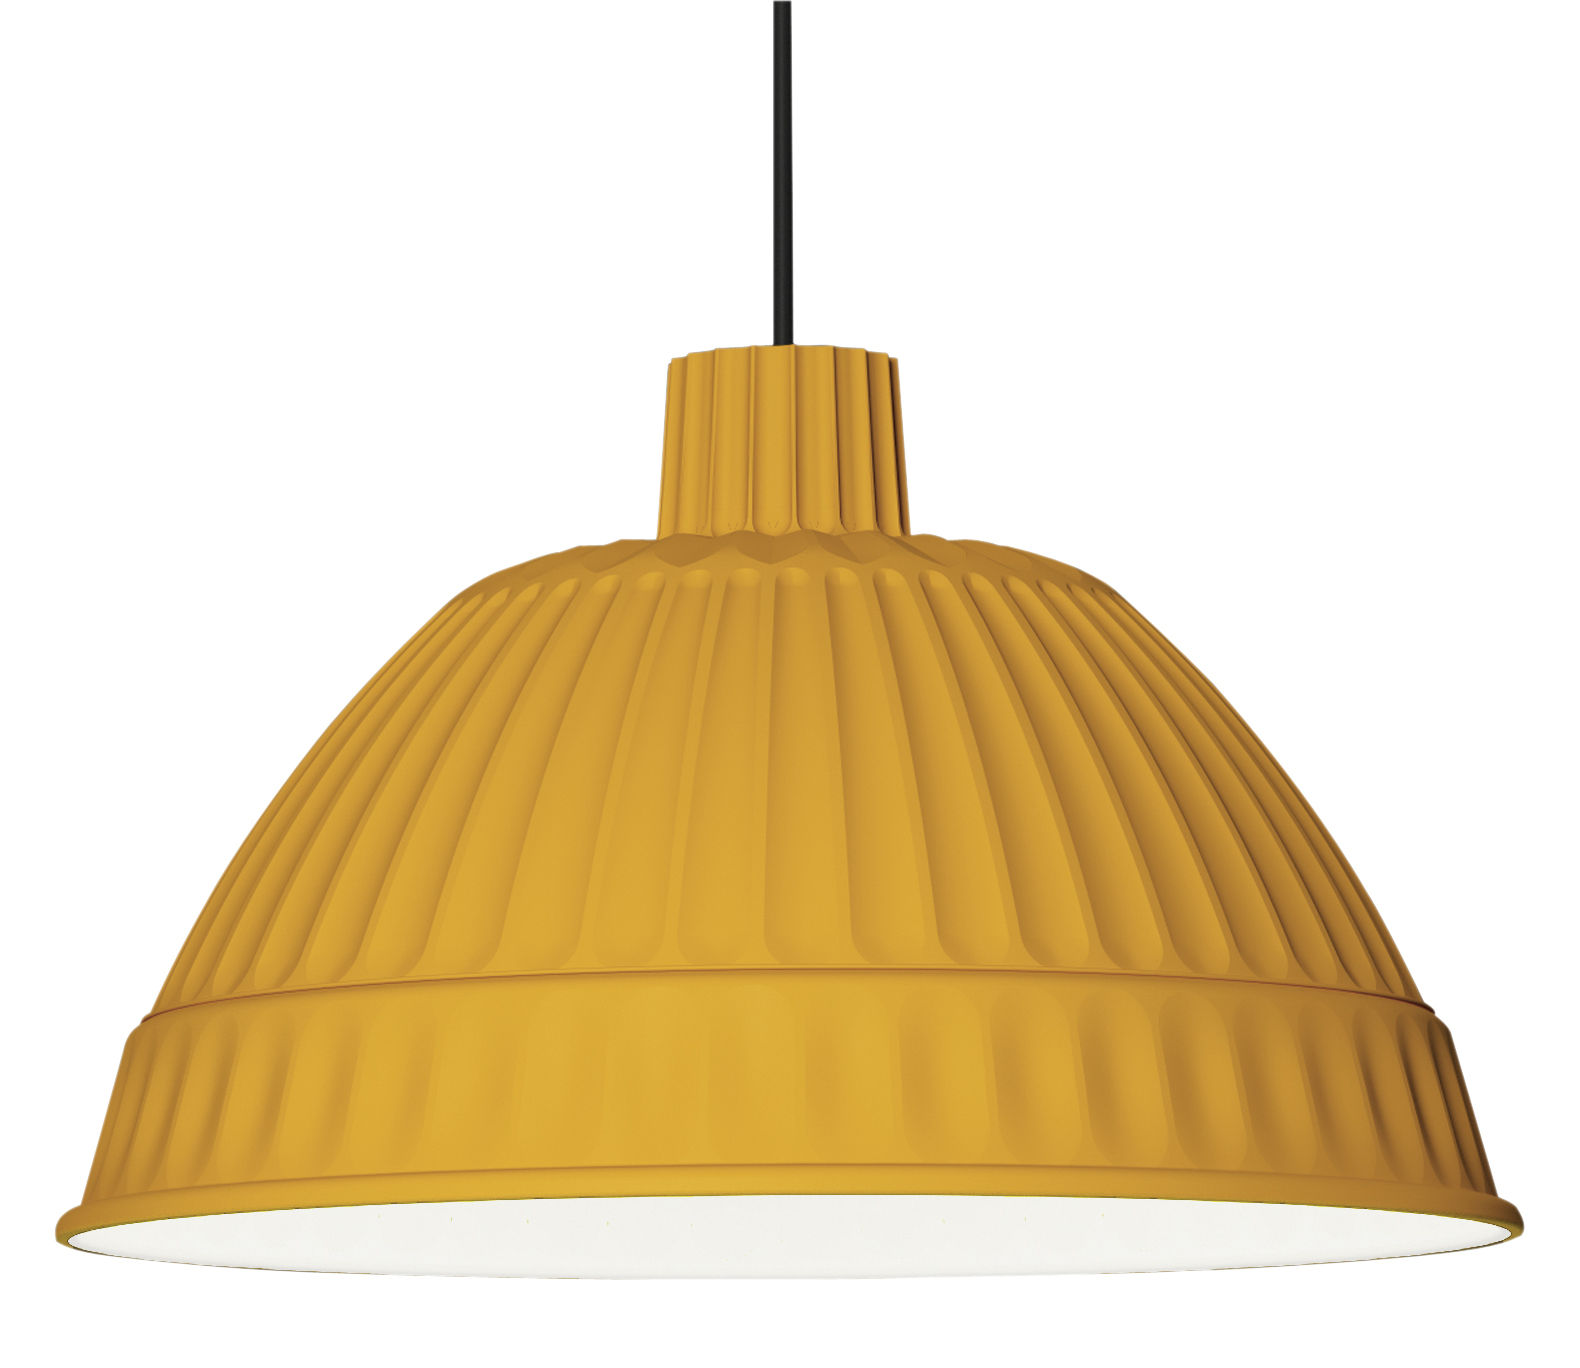 Lighting - Pendant Lighting - Cloche Pendant by Fontana Arte - Yellow - Polymer